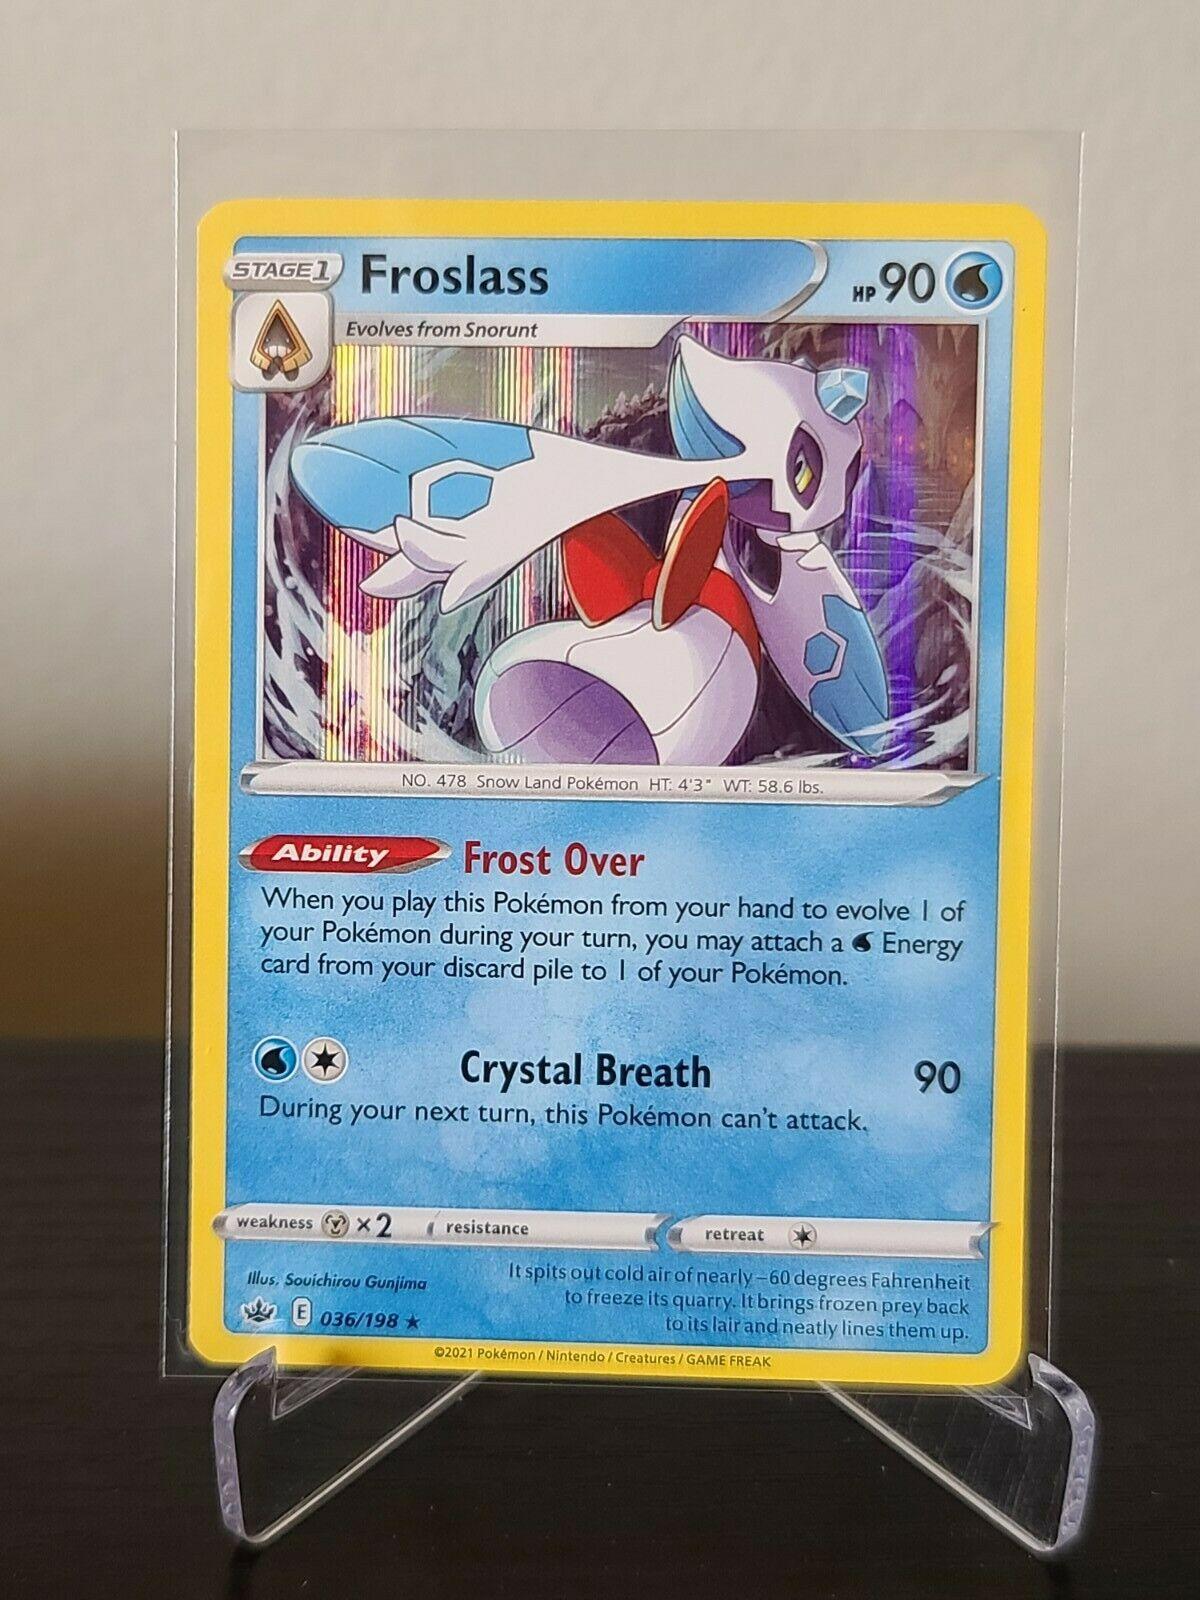 Pokemon FROSLASS 036/198 Chilling Reign - RARE HOLO - - MINT